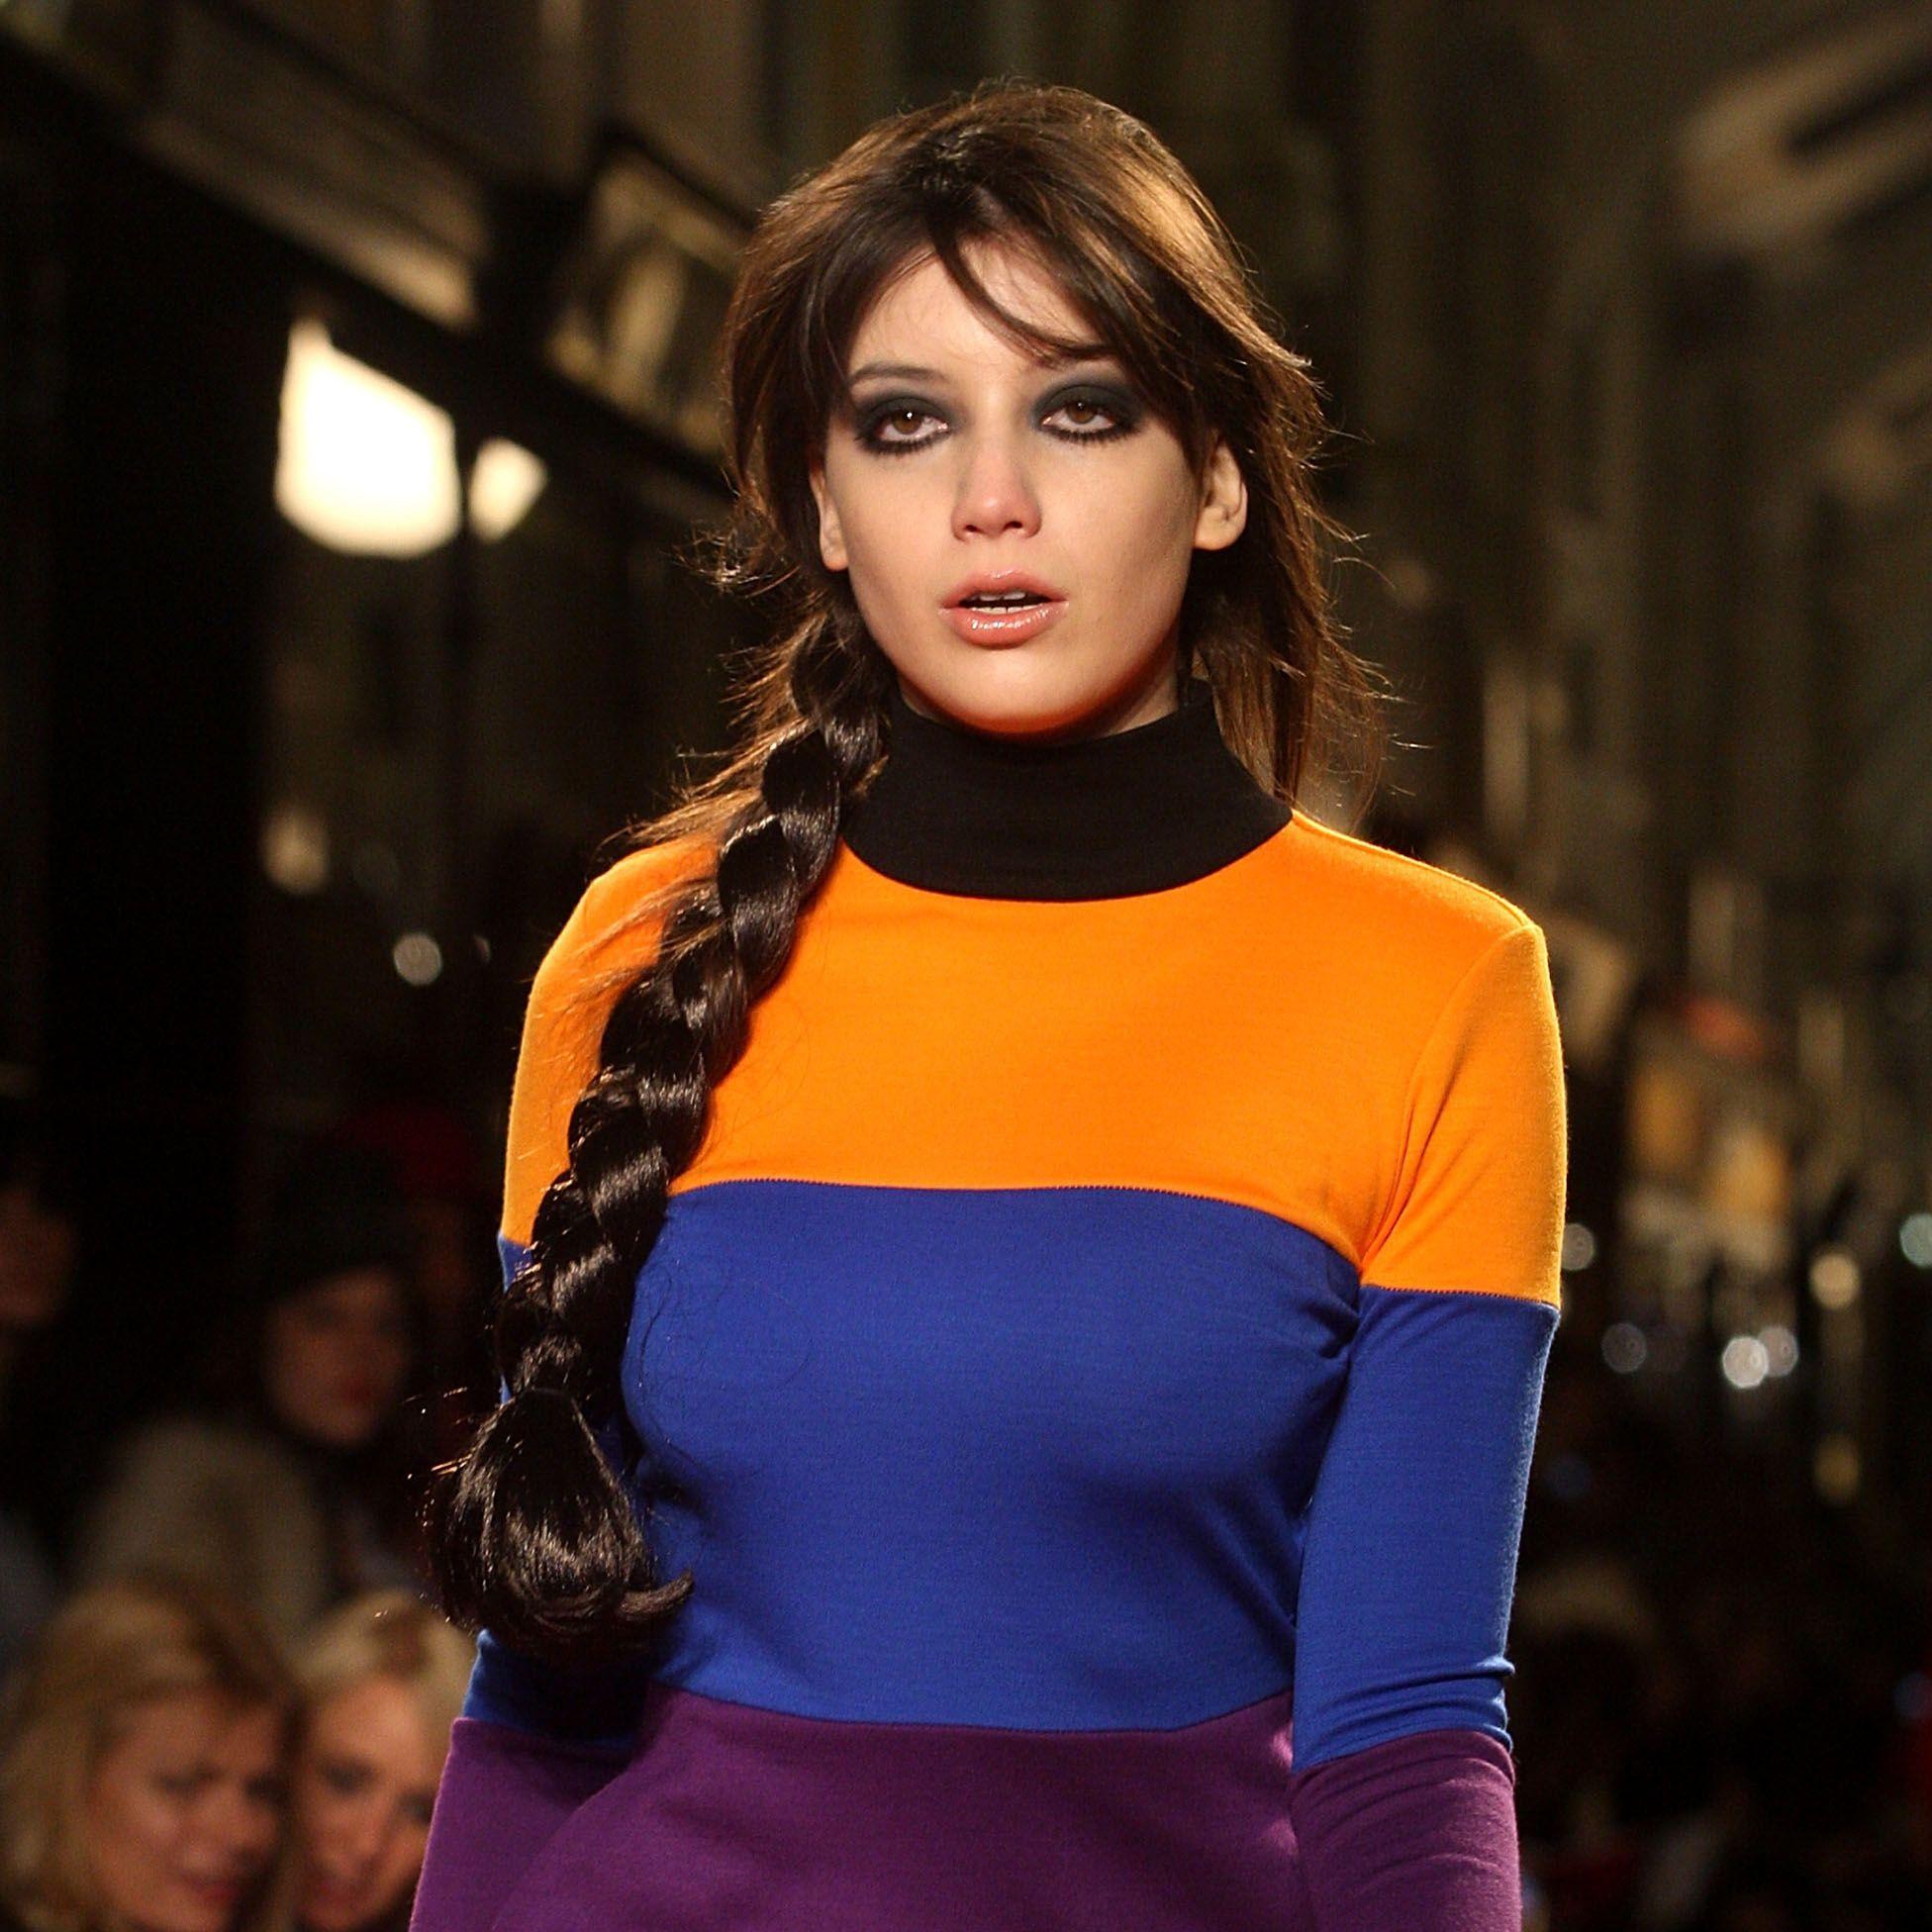 best catwalk model hairstyles